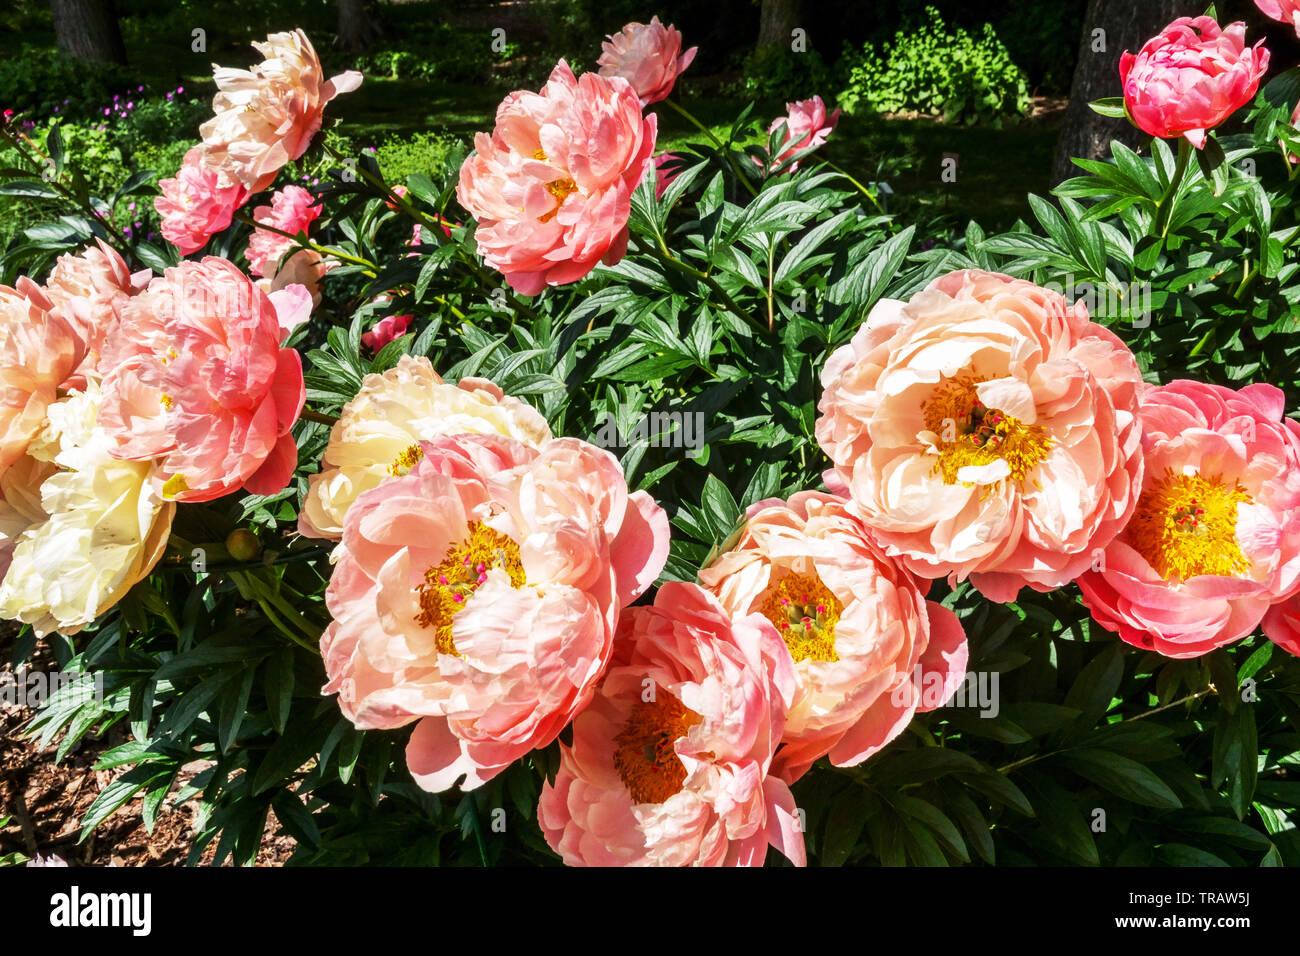 Beautiful Garden Flowers Pink Peony Paeonia Pink Hawaiian Coral